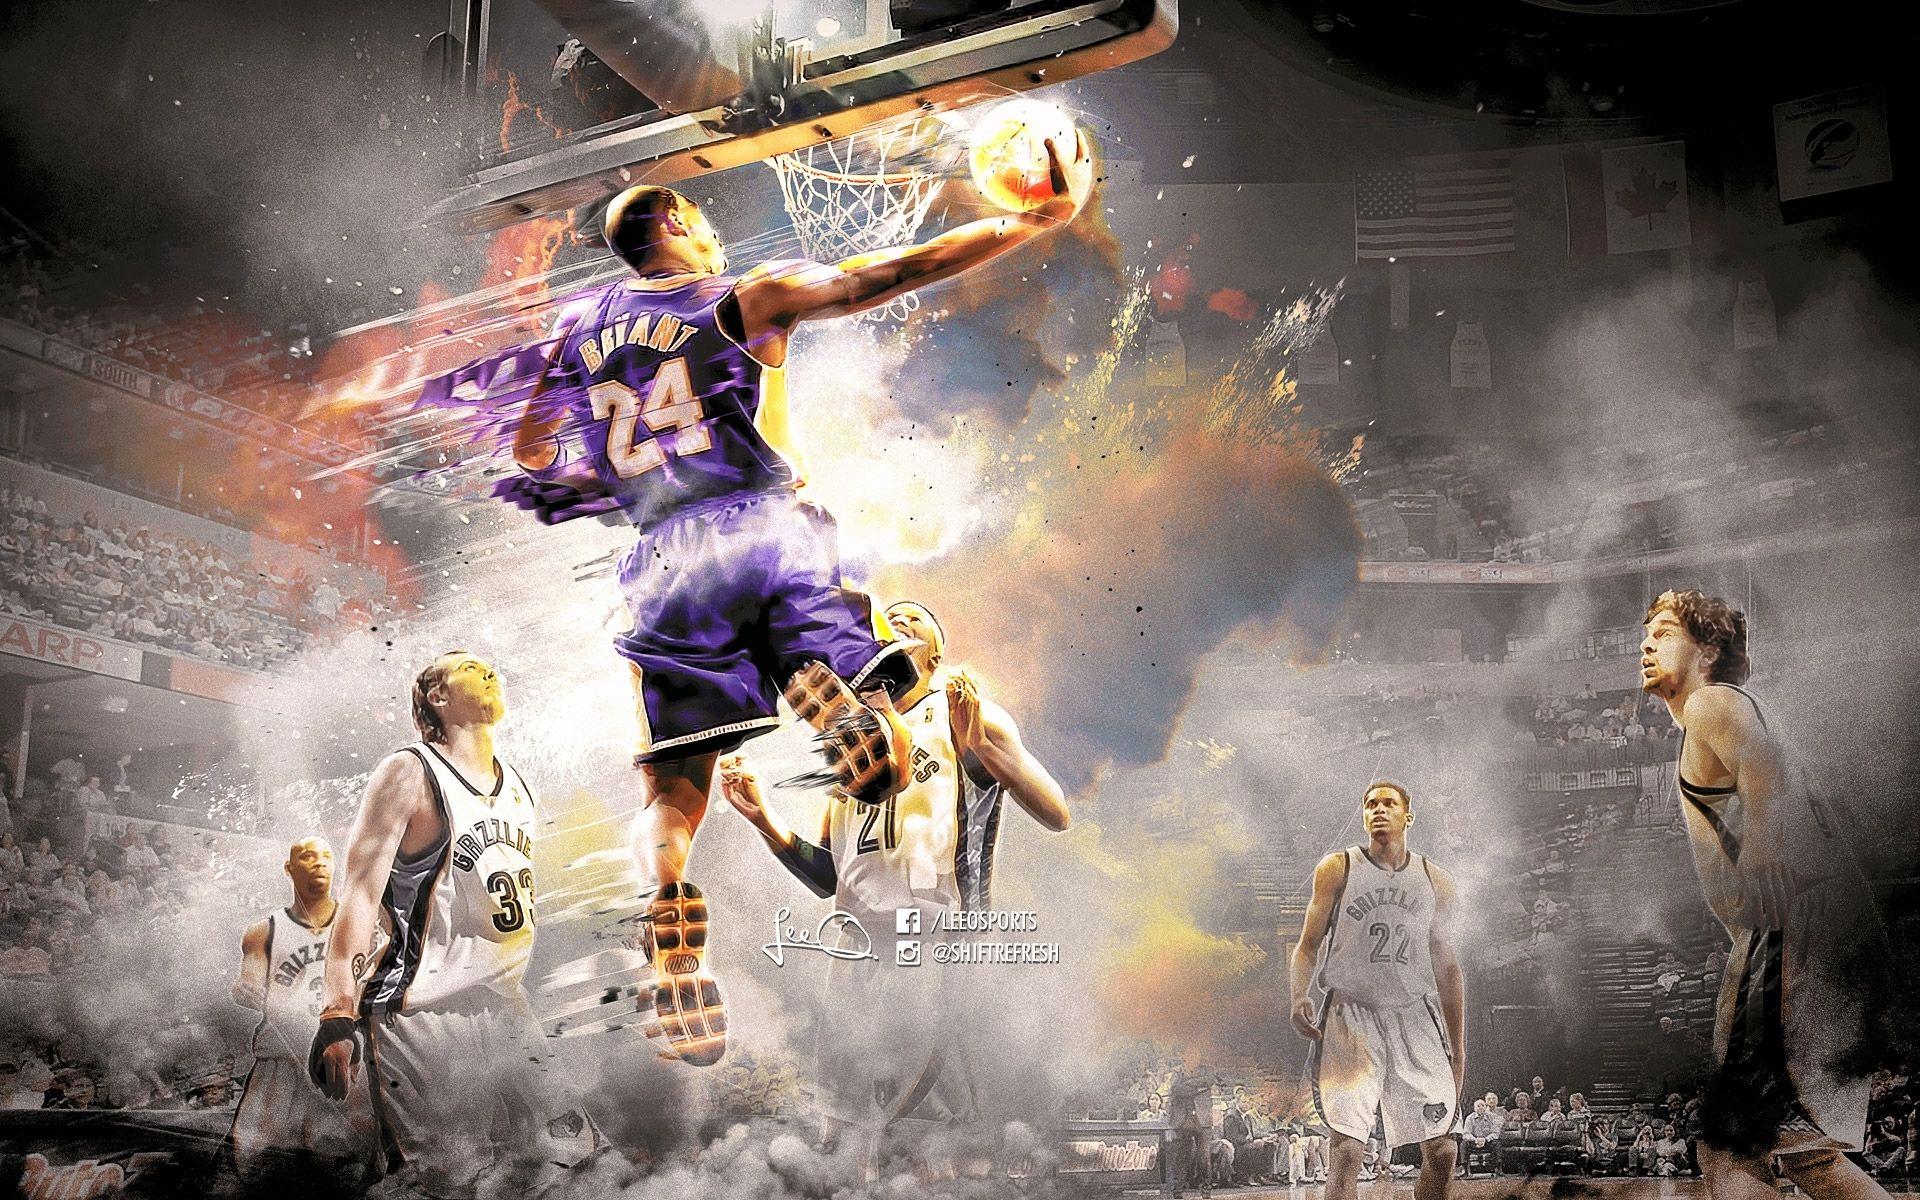 10 Latest Nba Kobe Bryant Wallpaper Full Hd 1080p For Pc Background Kobe Bryant Wallpaper Kobe Wallpapers Kobe Bryant